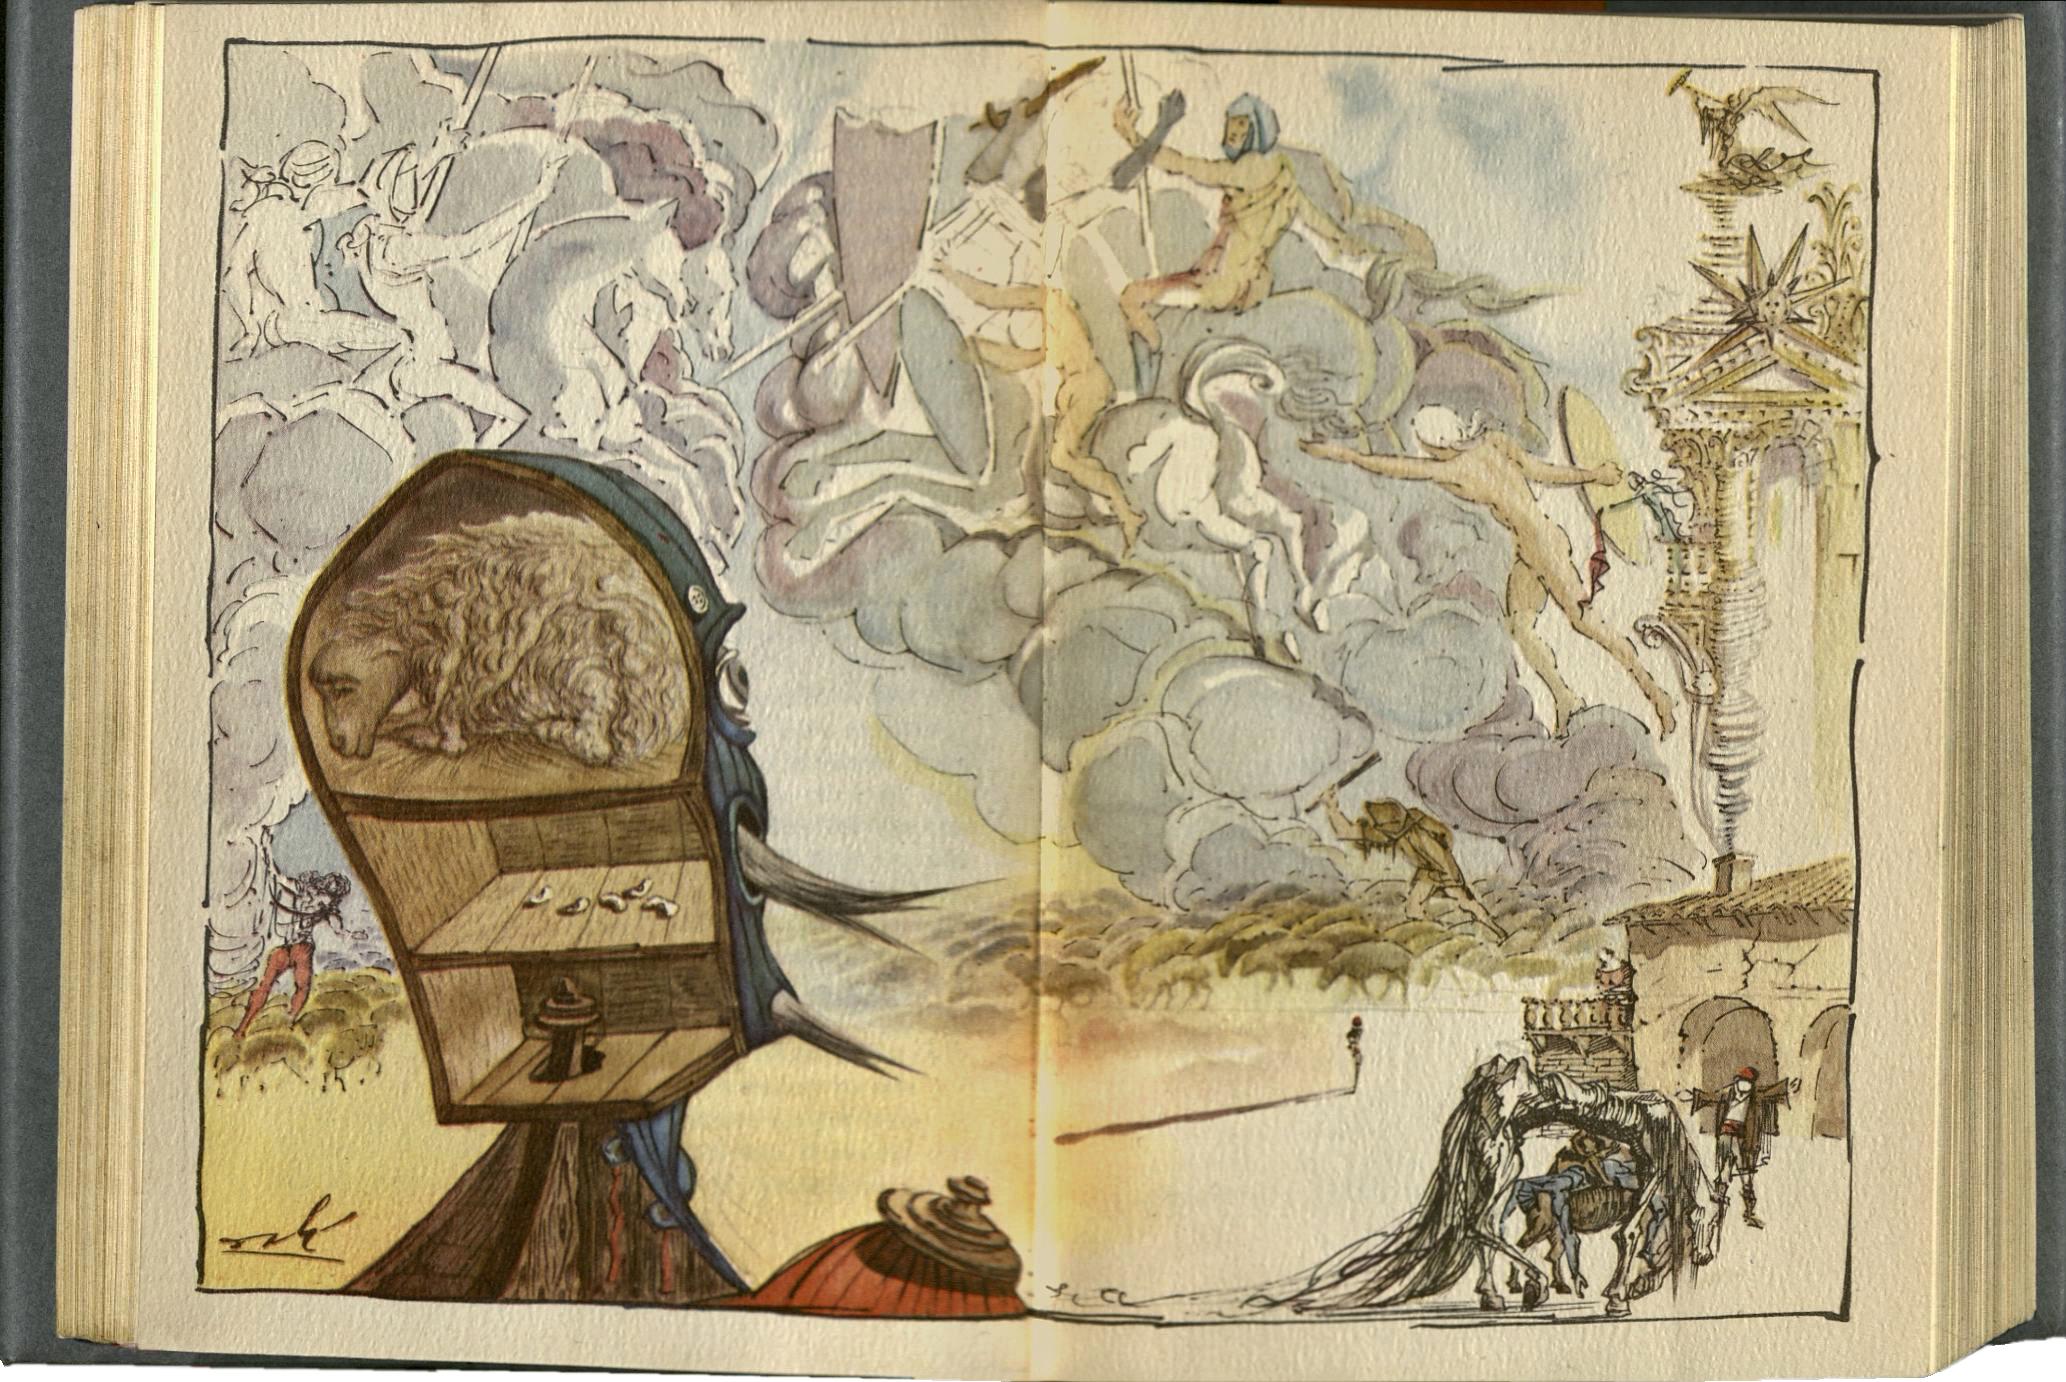 Salvador Dalí - Illustration for Don Quixote (1946)